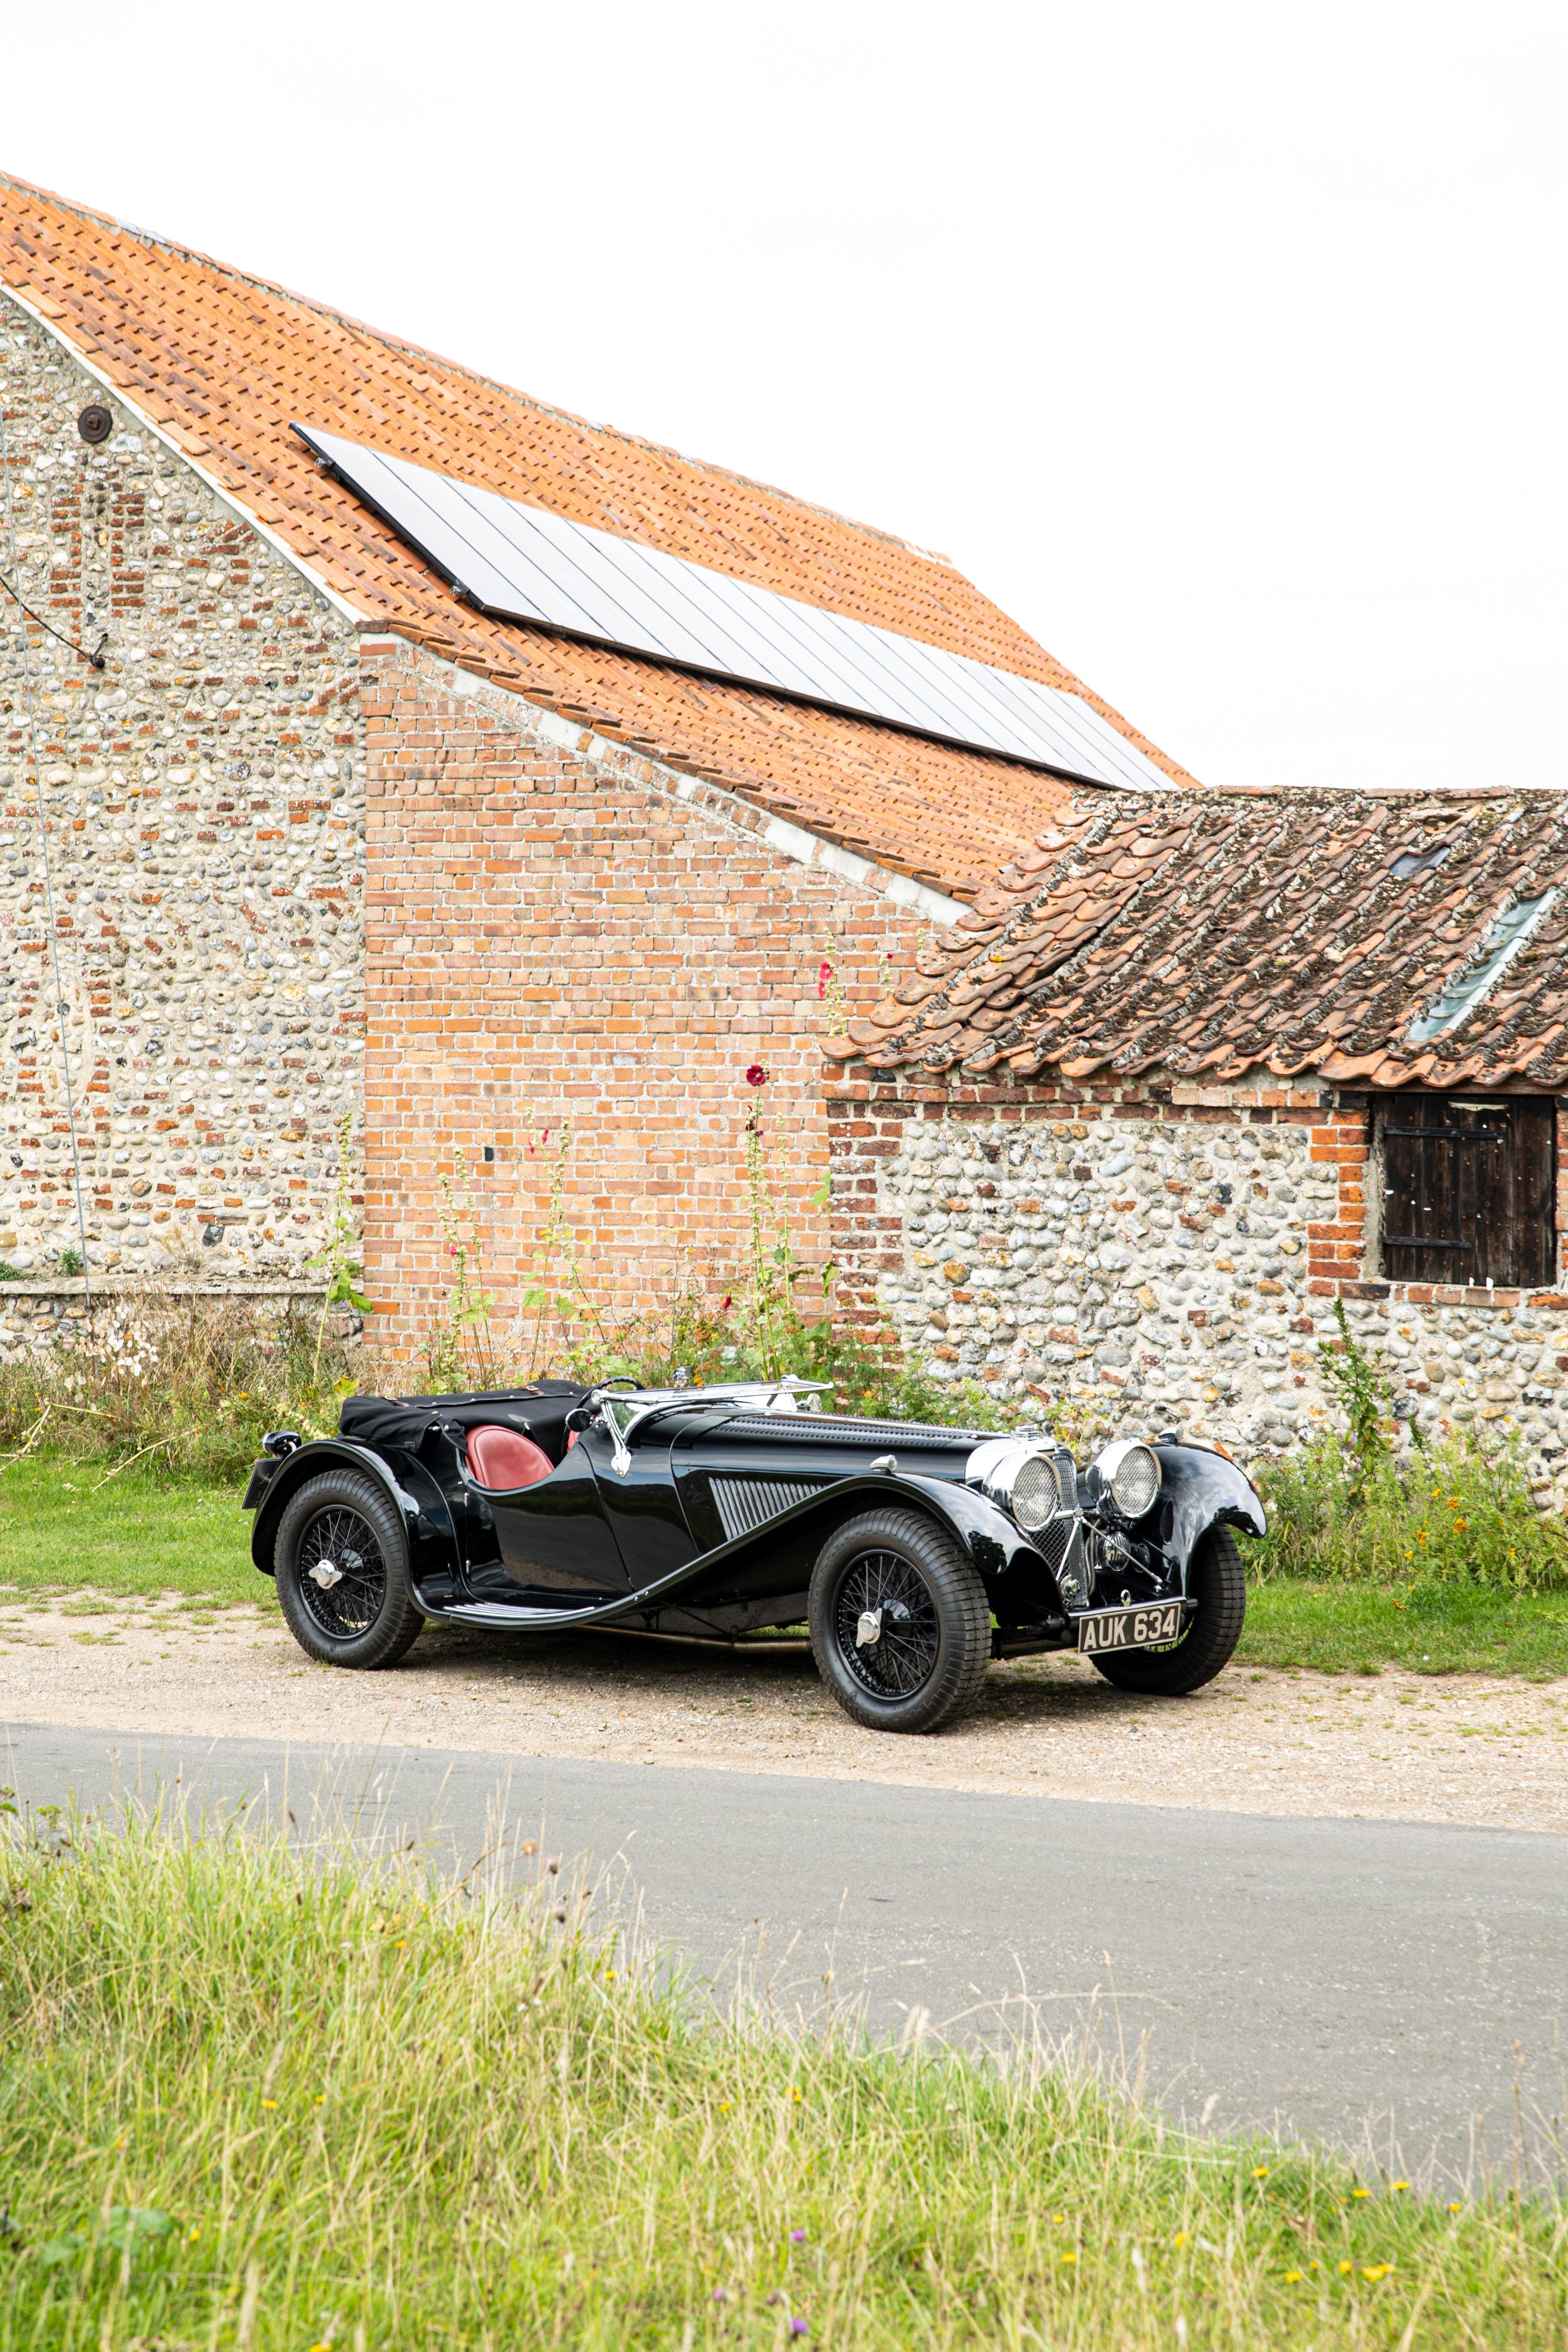 1937 Jaguar SS100 2½-Litre Roadster Chassis no. 18109